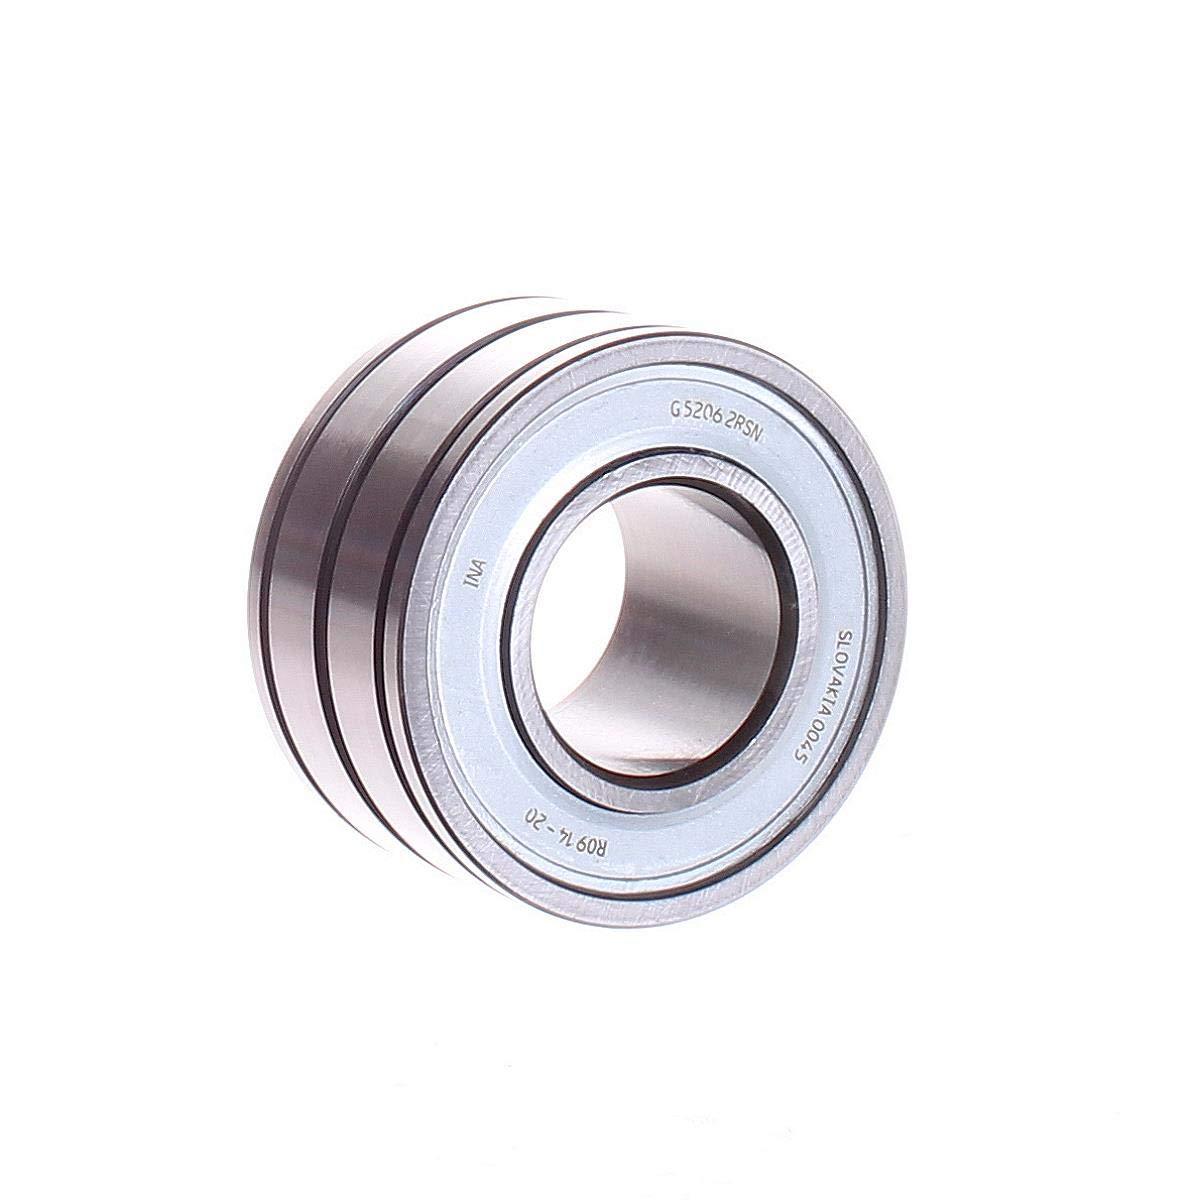 INA G52062RSN Ball Bearing, Double Row, 34MM Width, 62MM OD, 30MM ID